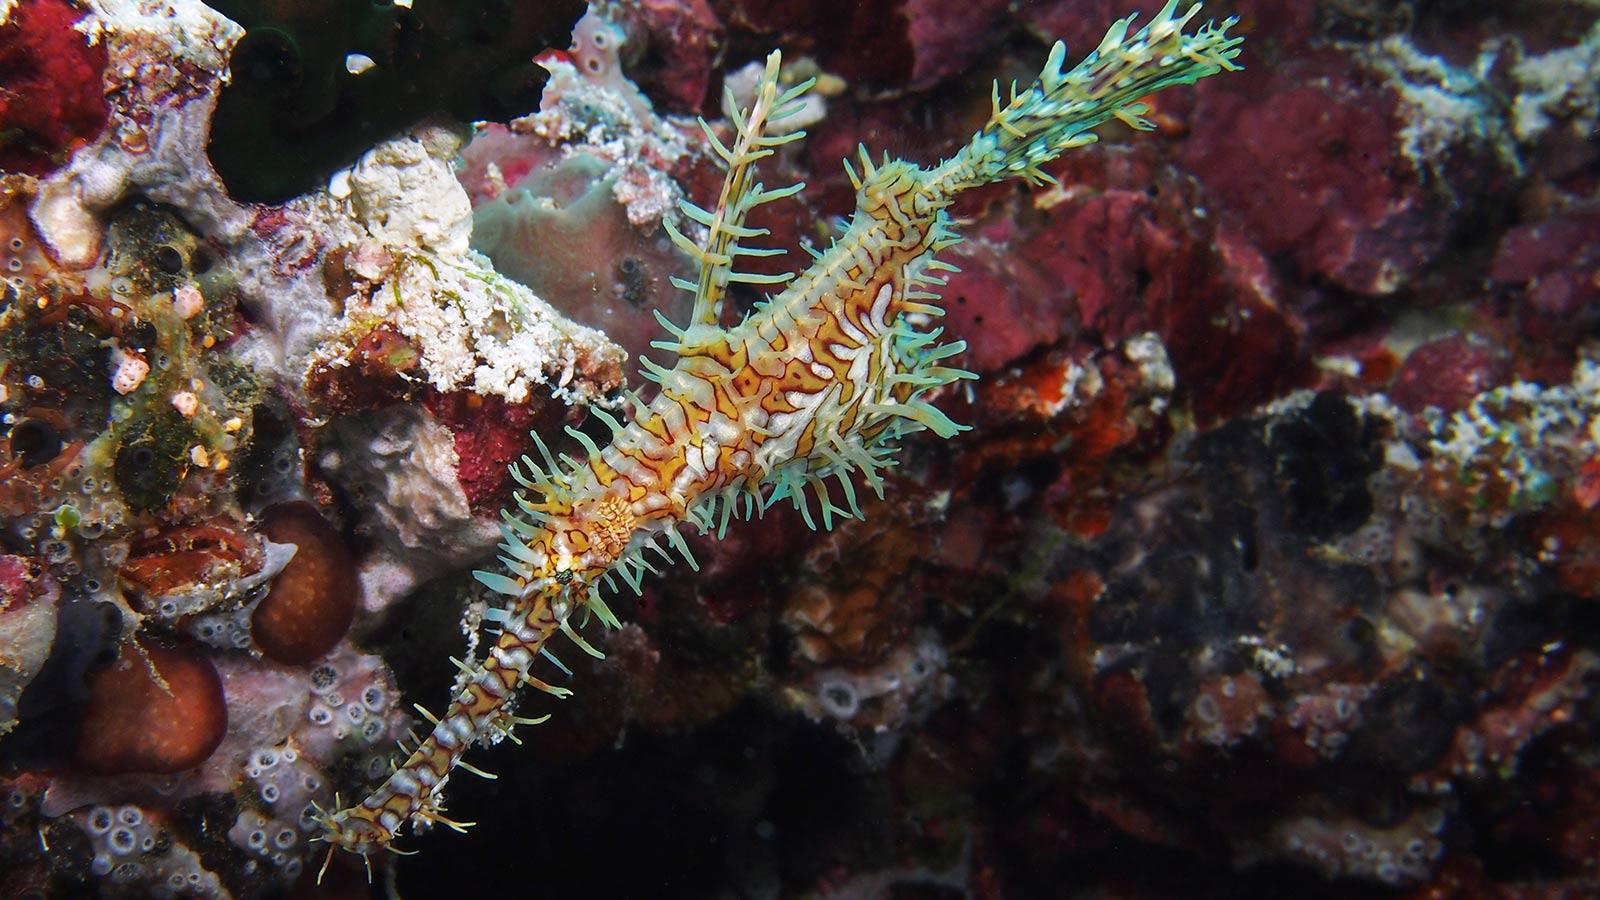 Ghostpipefish Maldives diving